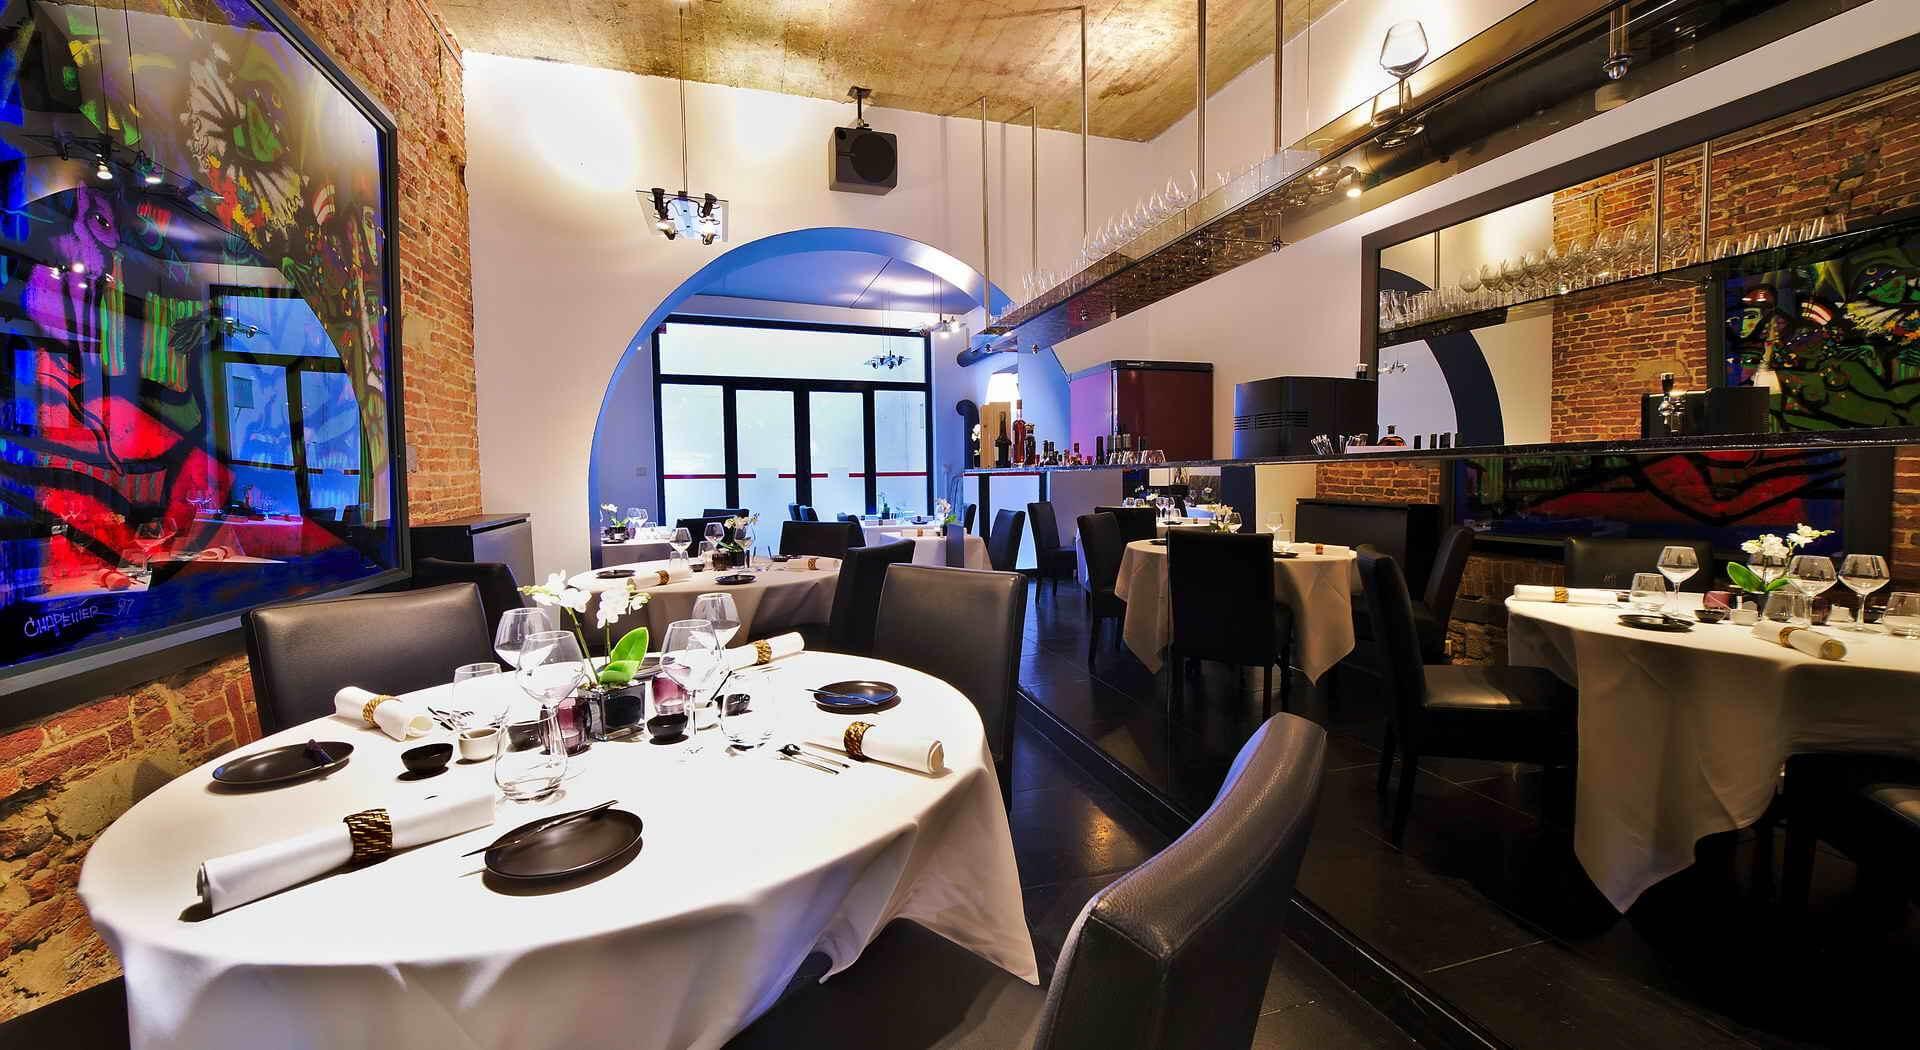 Интерьер ресторана La table de mus